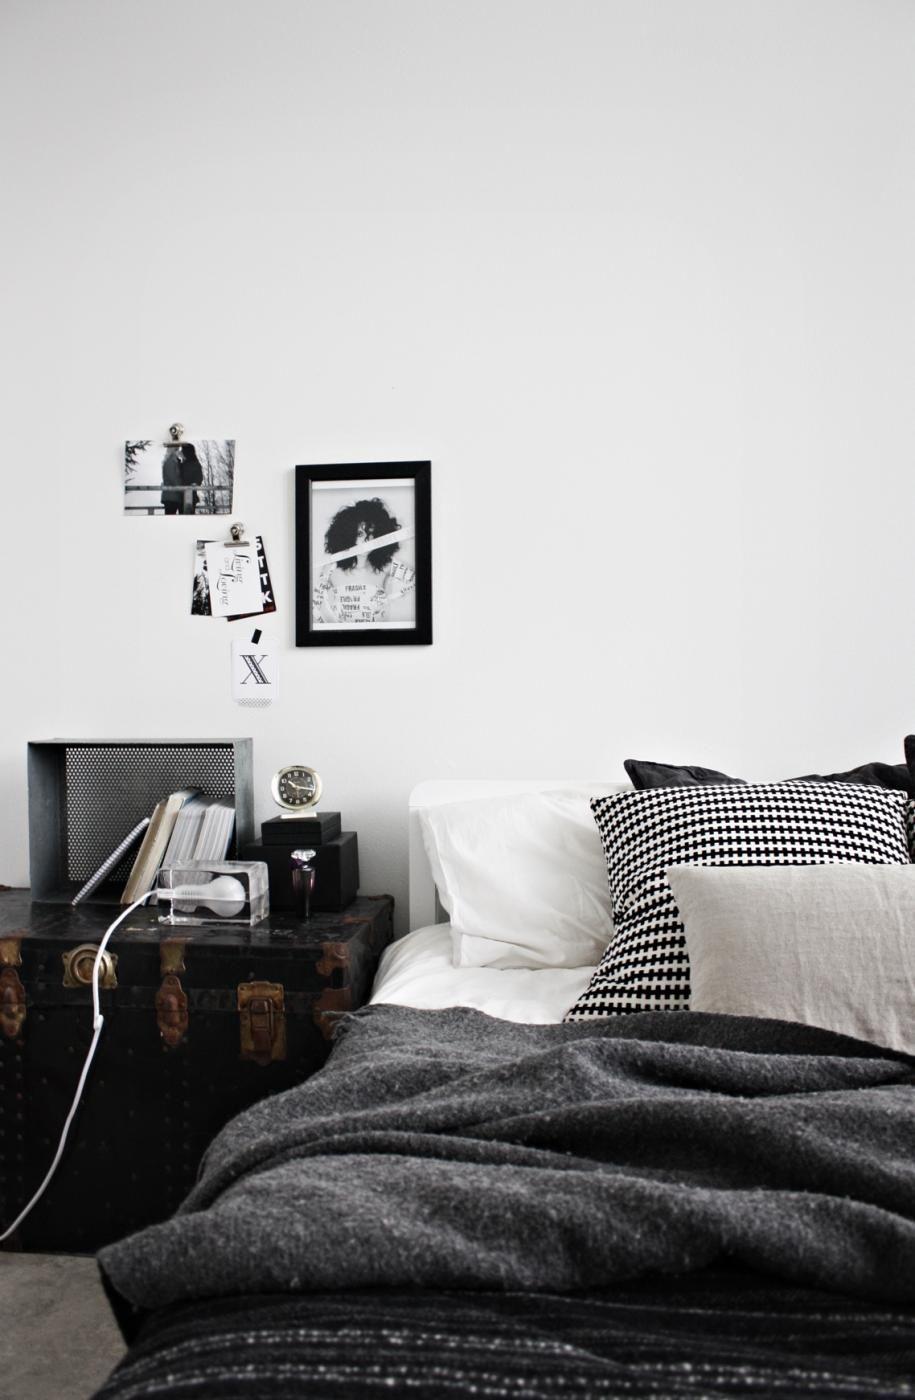 Auf unserer wunschliste design house stockholm alles was du